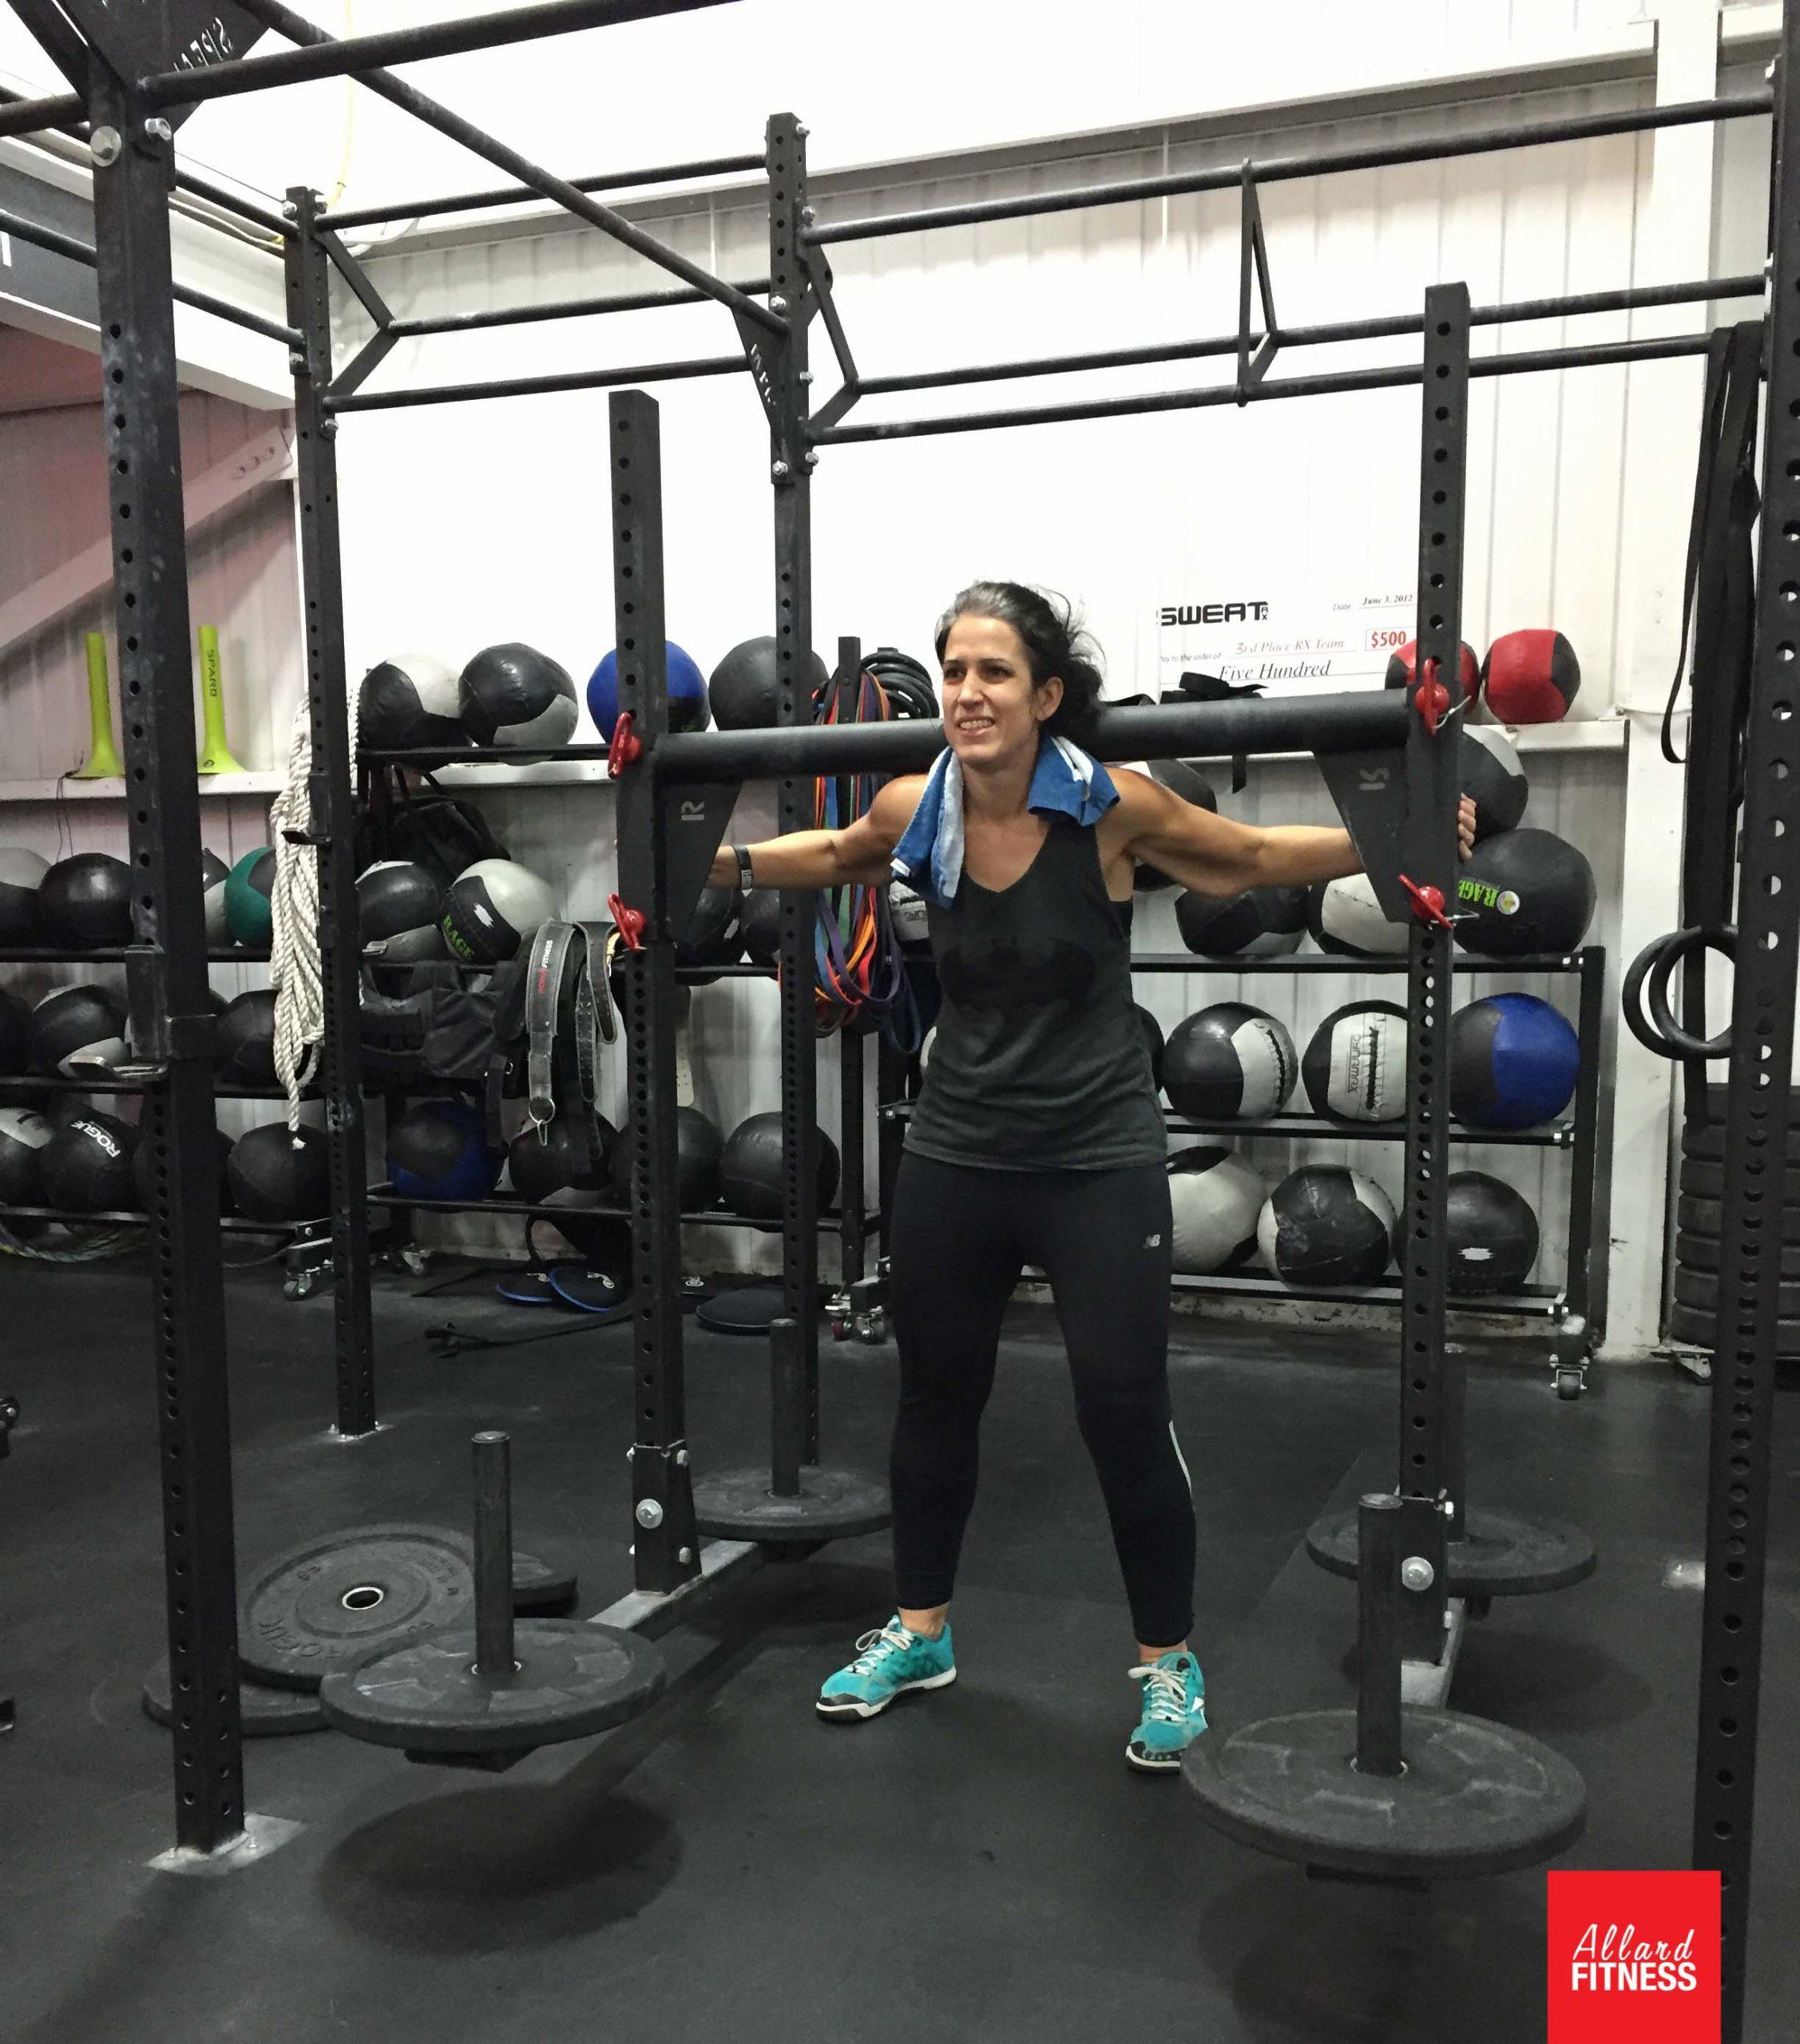 reconnaitre ses accomplissements strongman gym allardfitness allard fitness